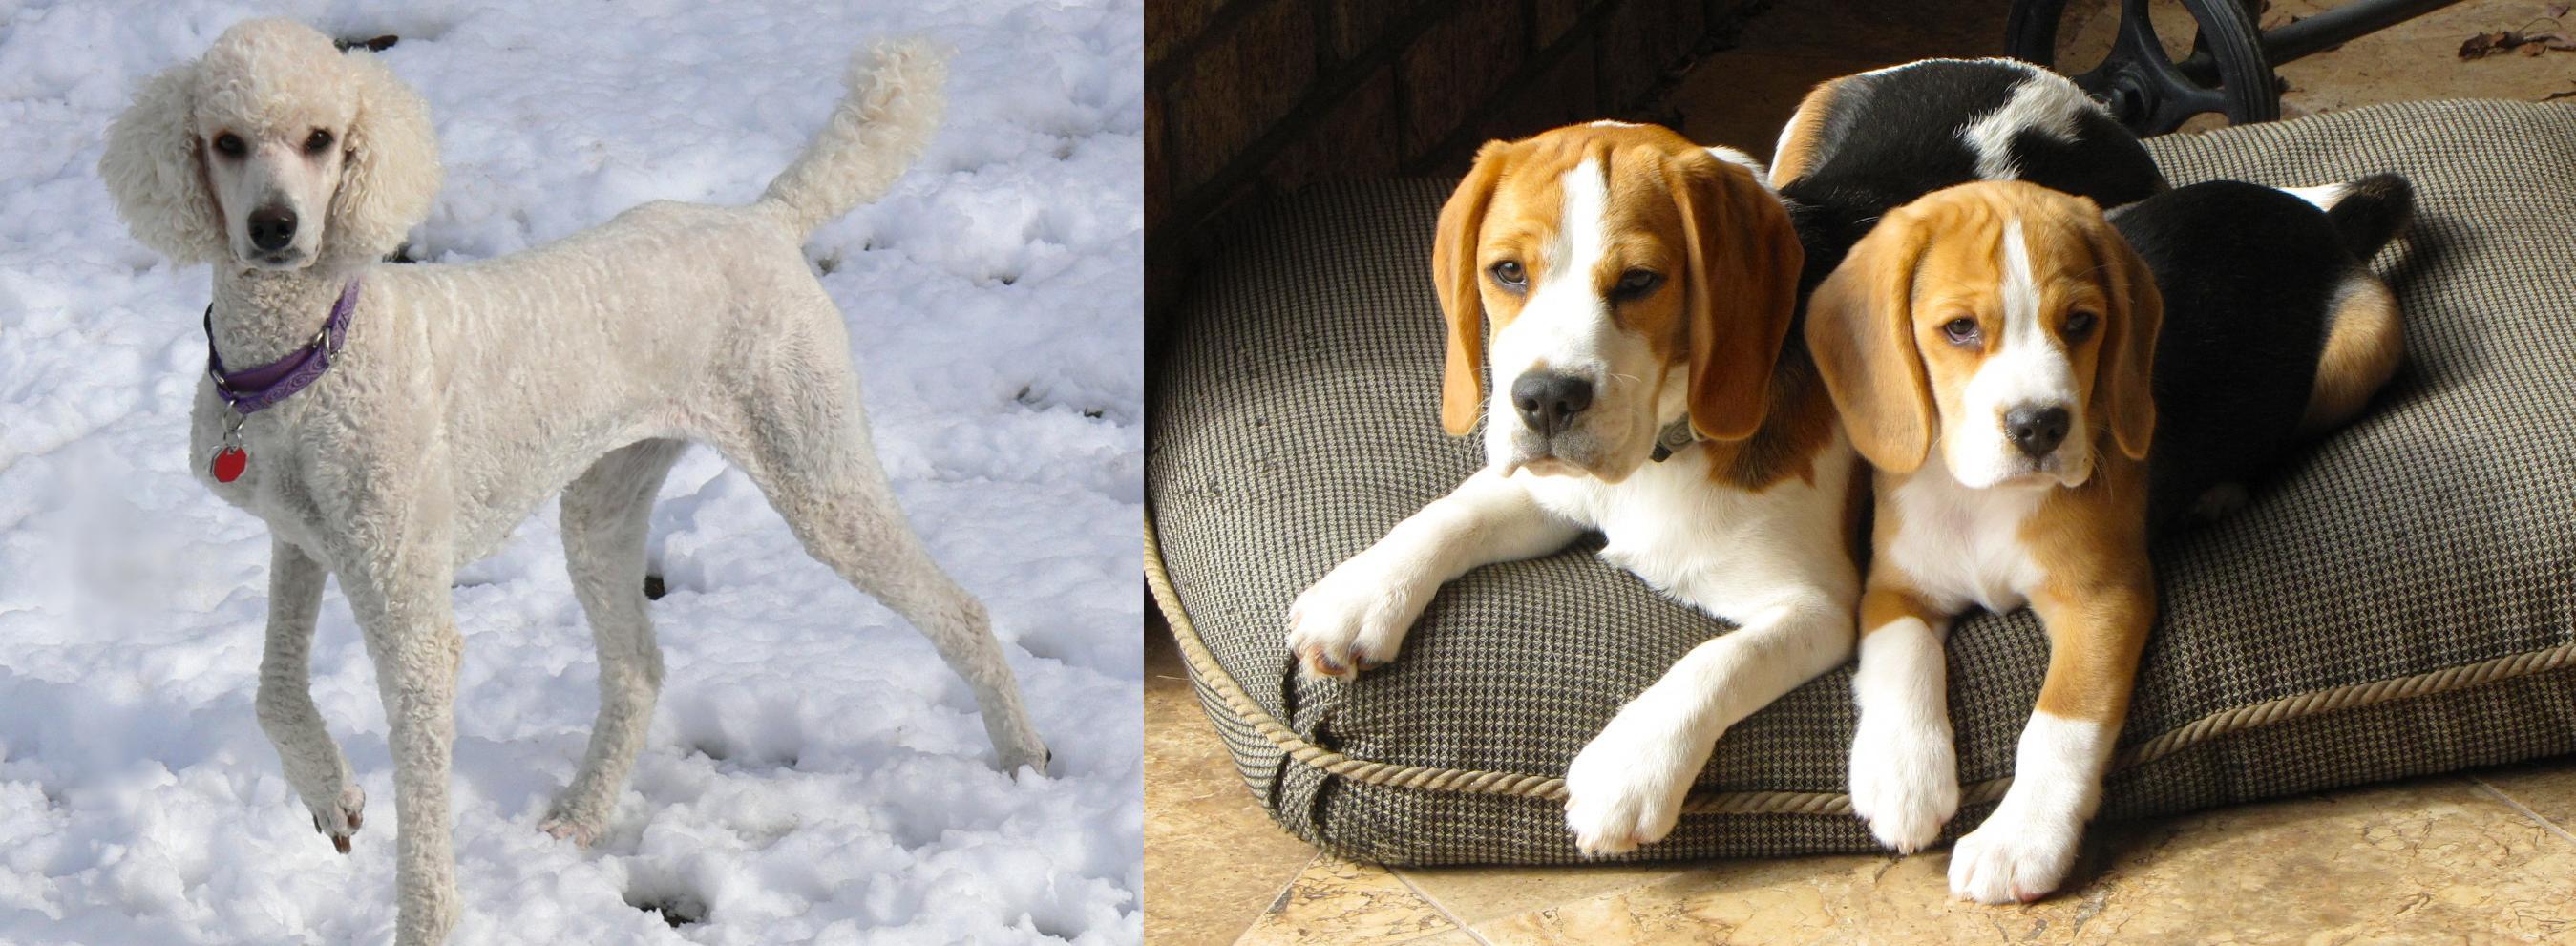 Poodle Vs Beagle Breed Comparison Mydogbreeds